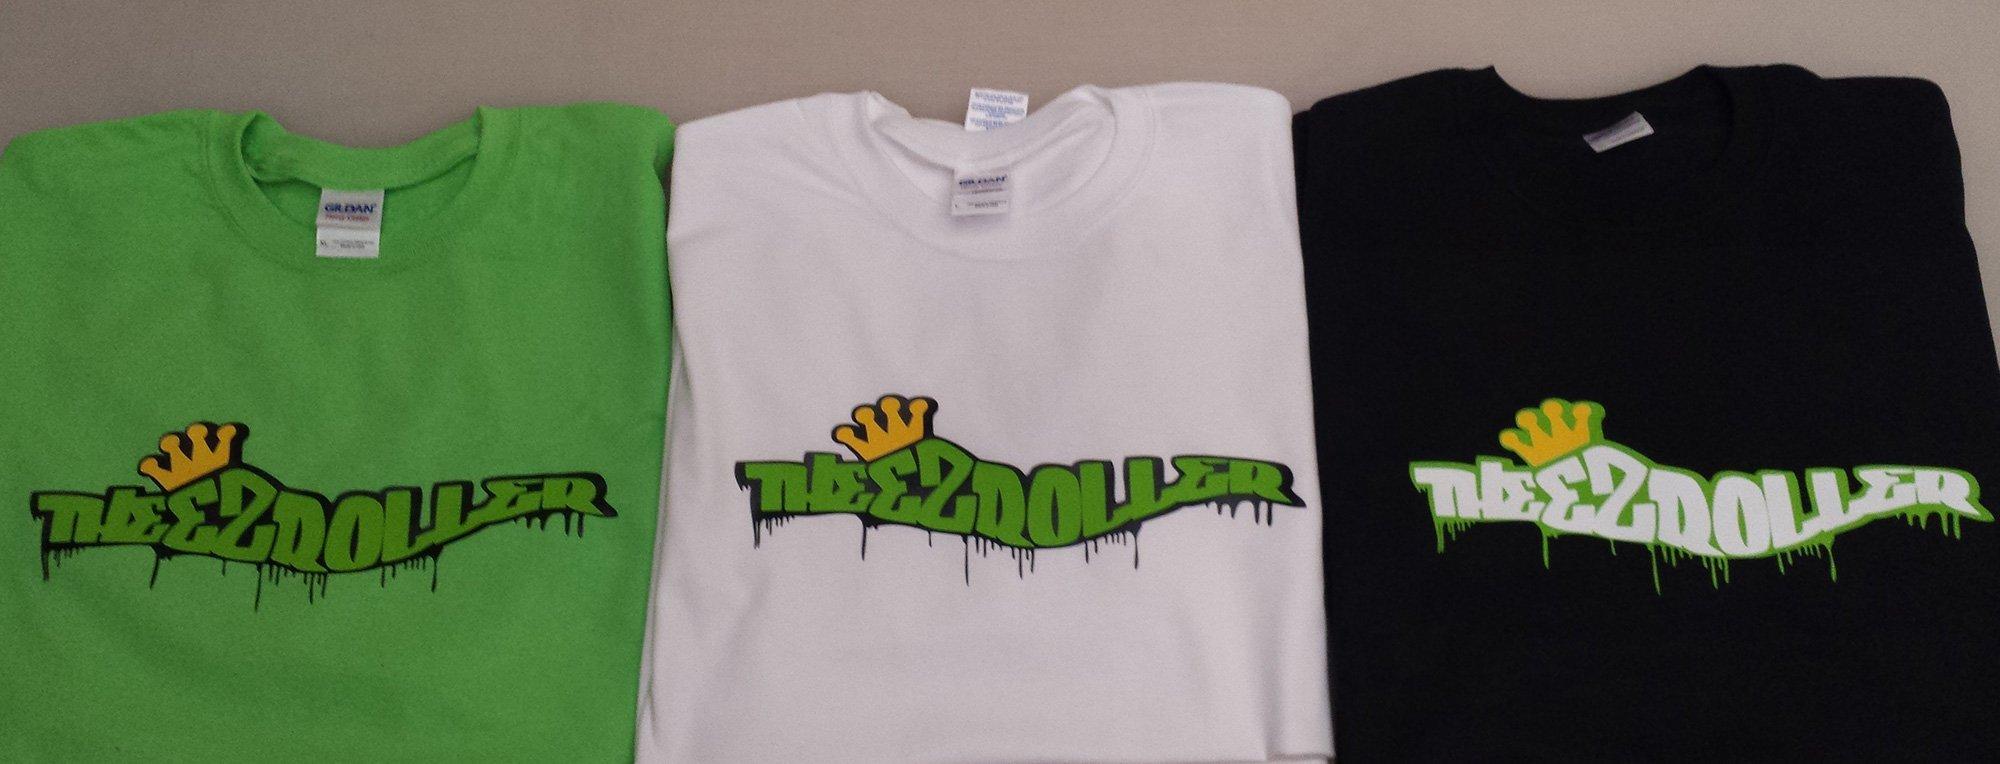 personalised clothing printing